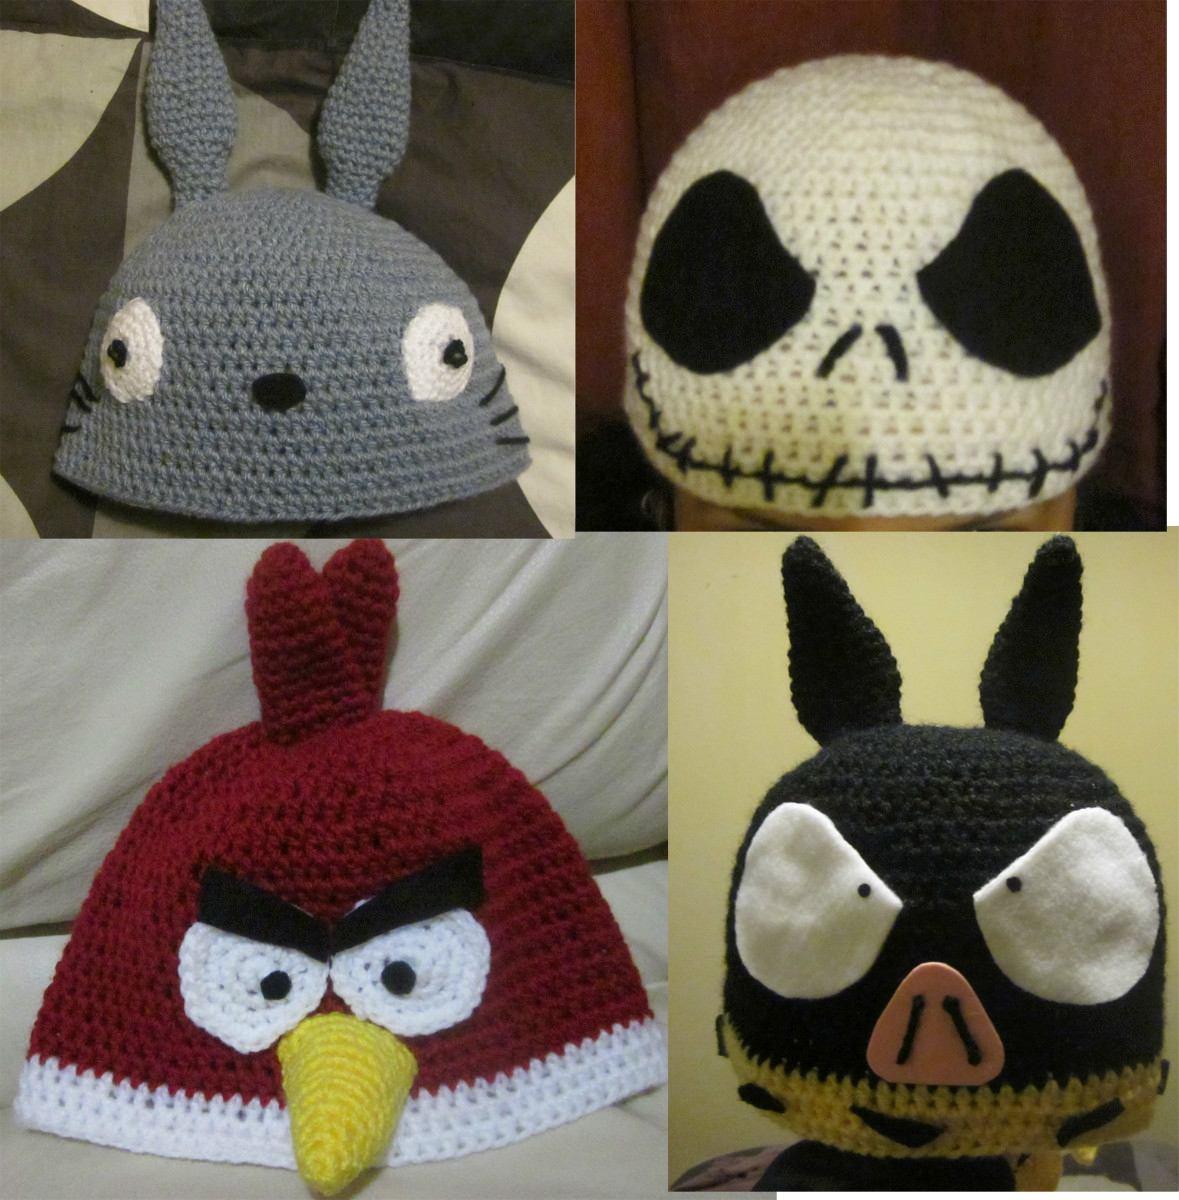 cb55a344d2caa free gorros crochet bender homero kirby totoro pchan y ms with gorros de  lana a ganchillo